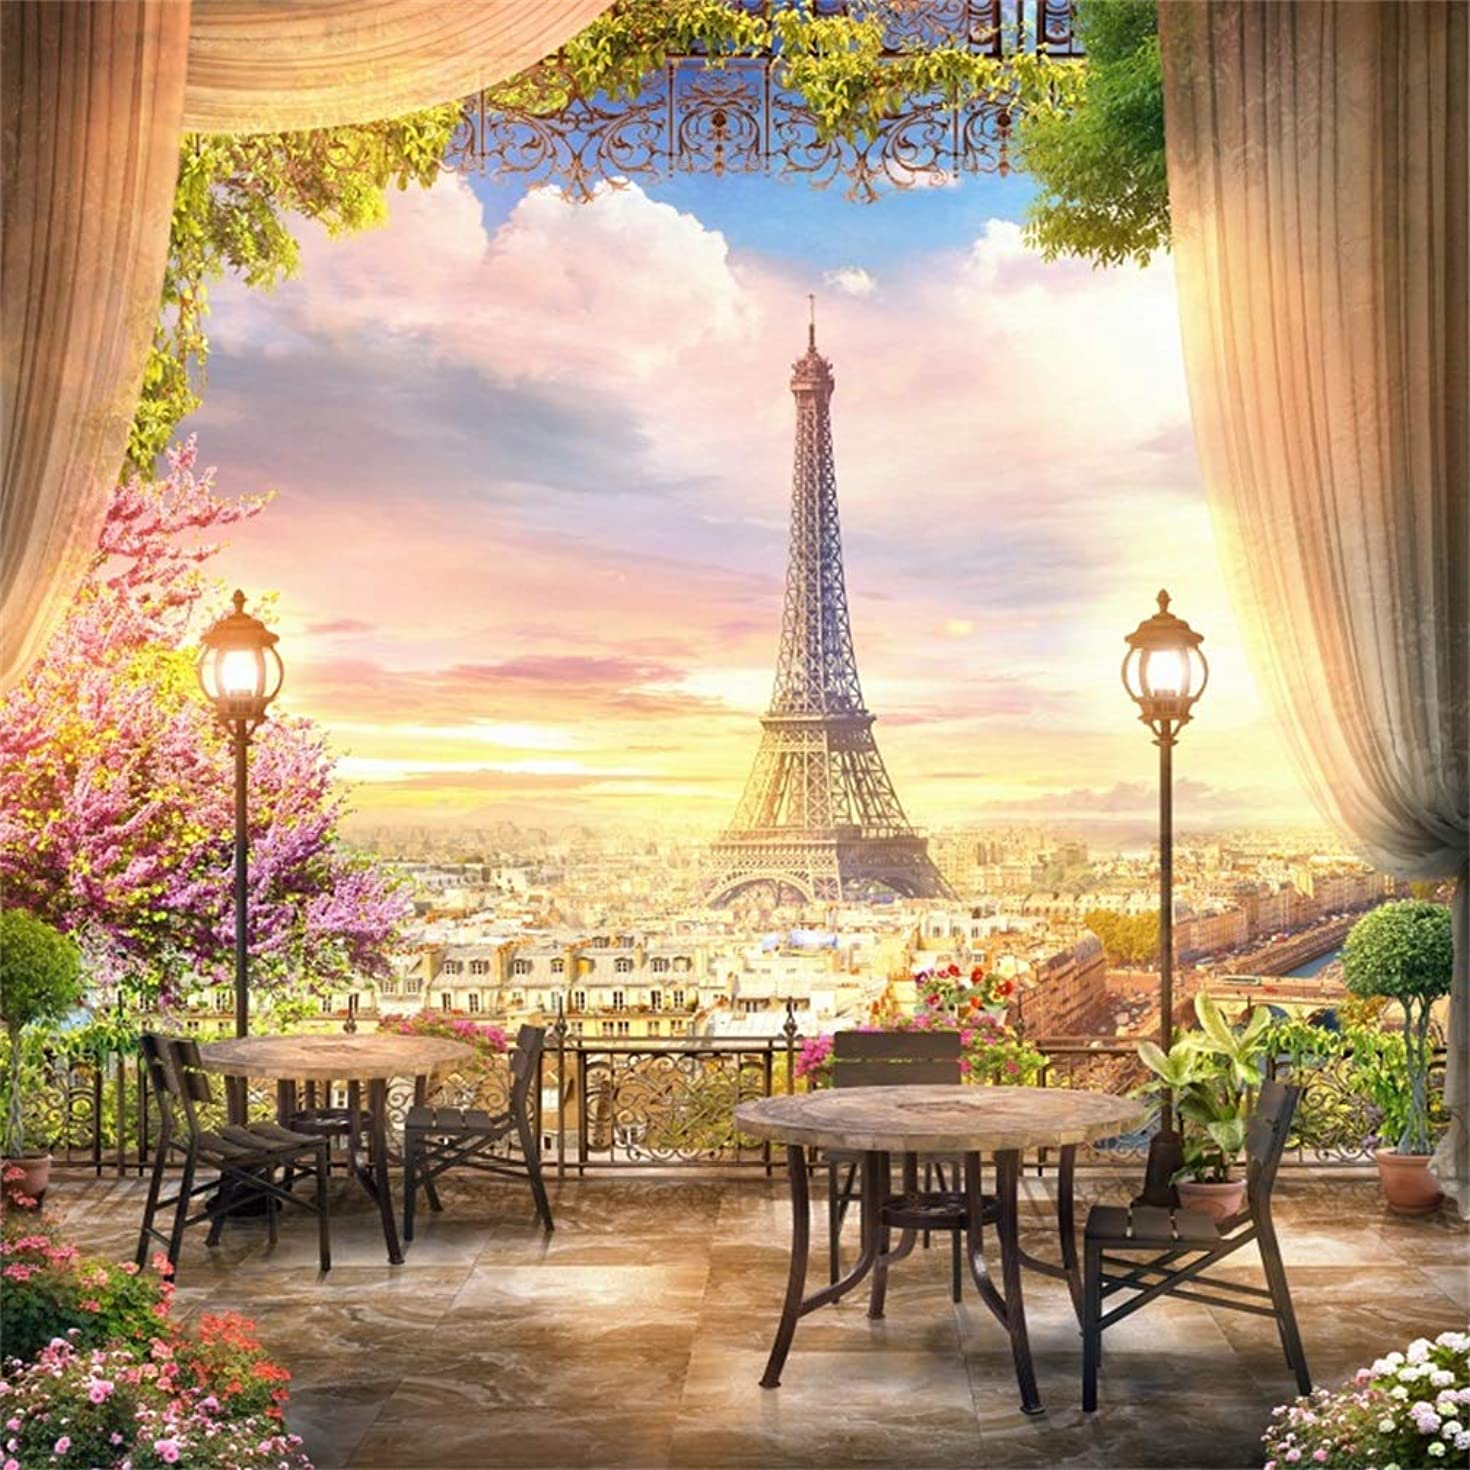 LFEEY 7x7ft French Dreamlike Paris Eiffel Tower Backdrop Balcony Curtain Flowers City View Photography Background Garden Tea Party Decoration Terrace Veranda Lamp Photo Booth Studio Prop Vinyl Banner